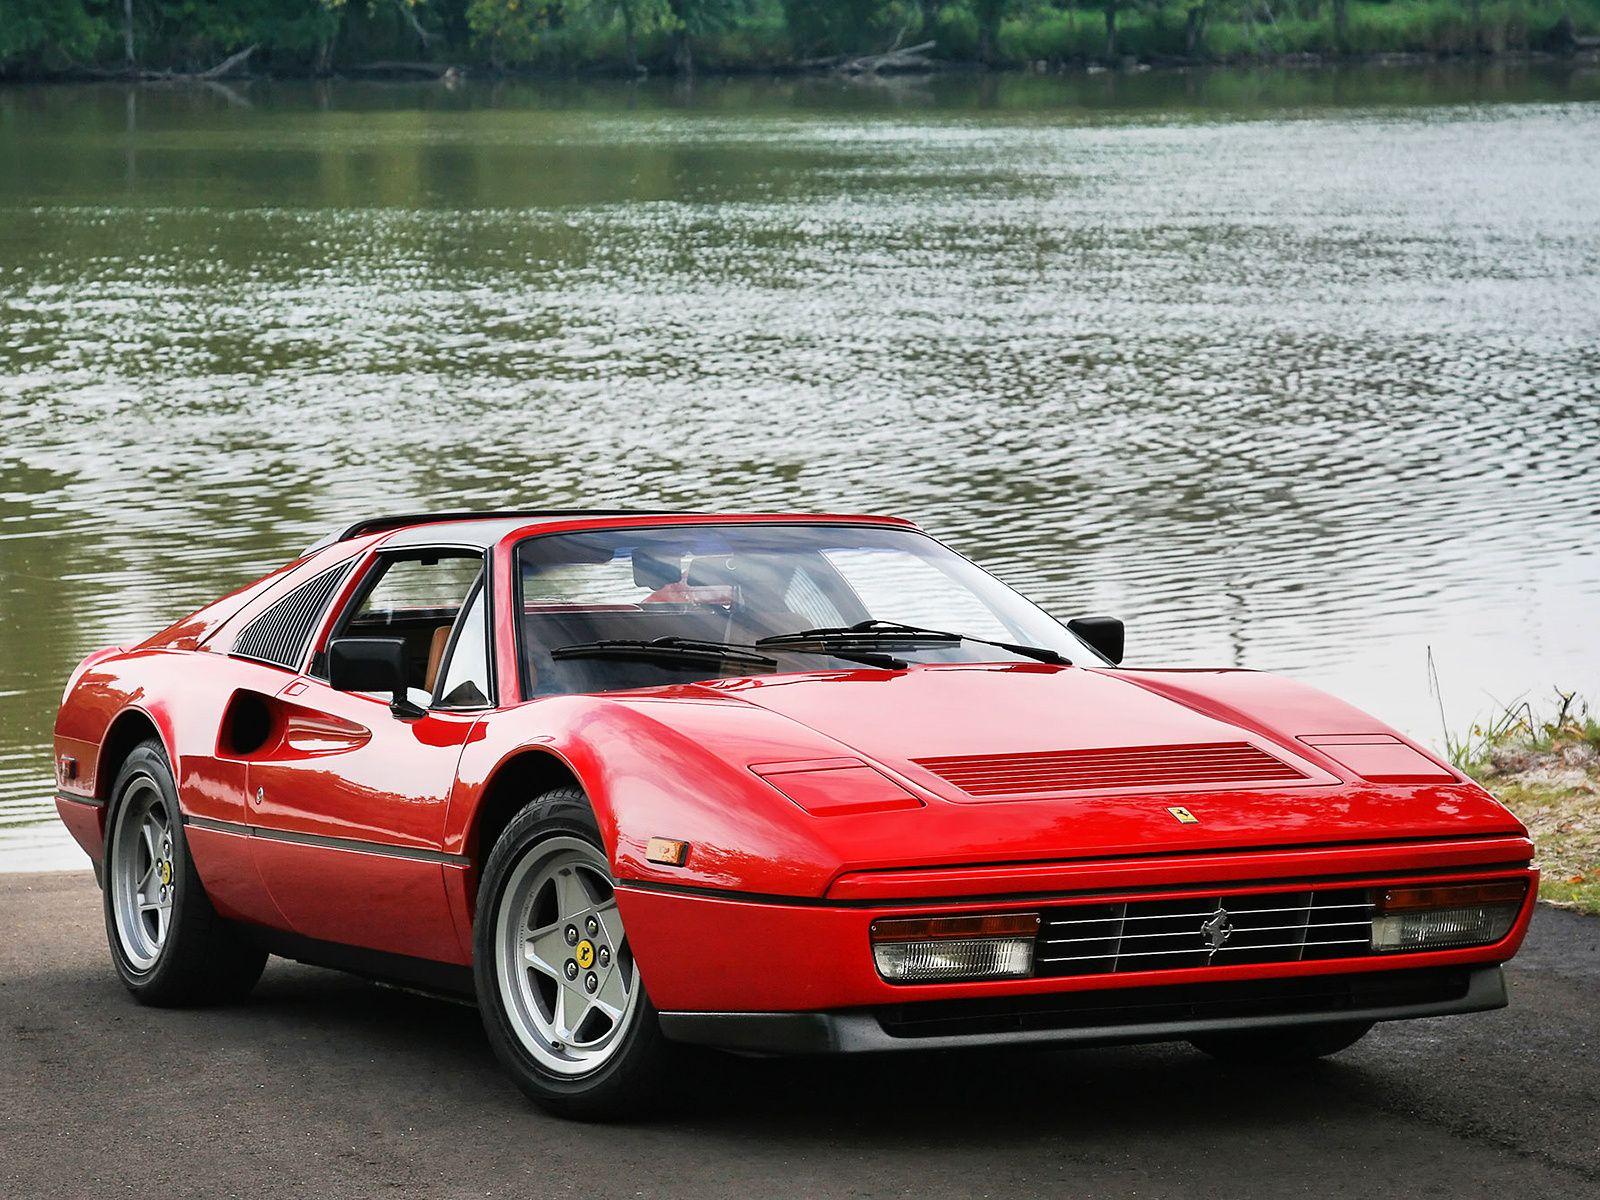 31ddd071f9e026af607925c7e8710759 Marvelous Photo Ferrari Mondial 8 Quattrovalvole Rouge Occasion Cars Trend